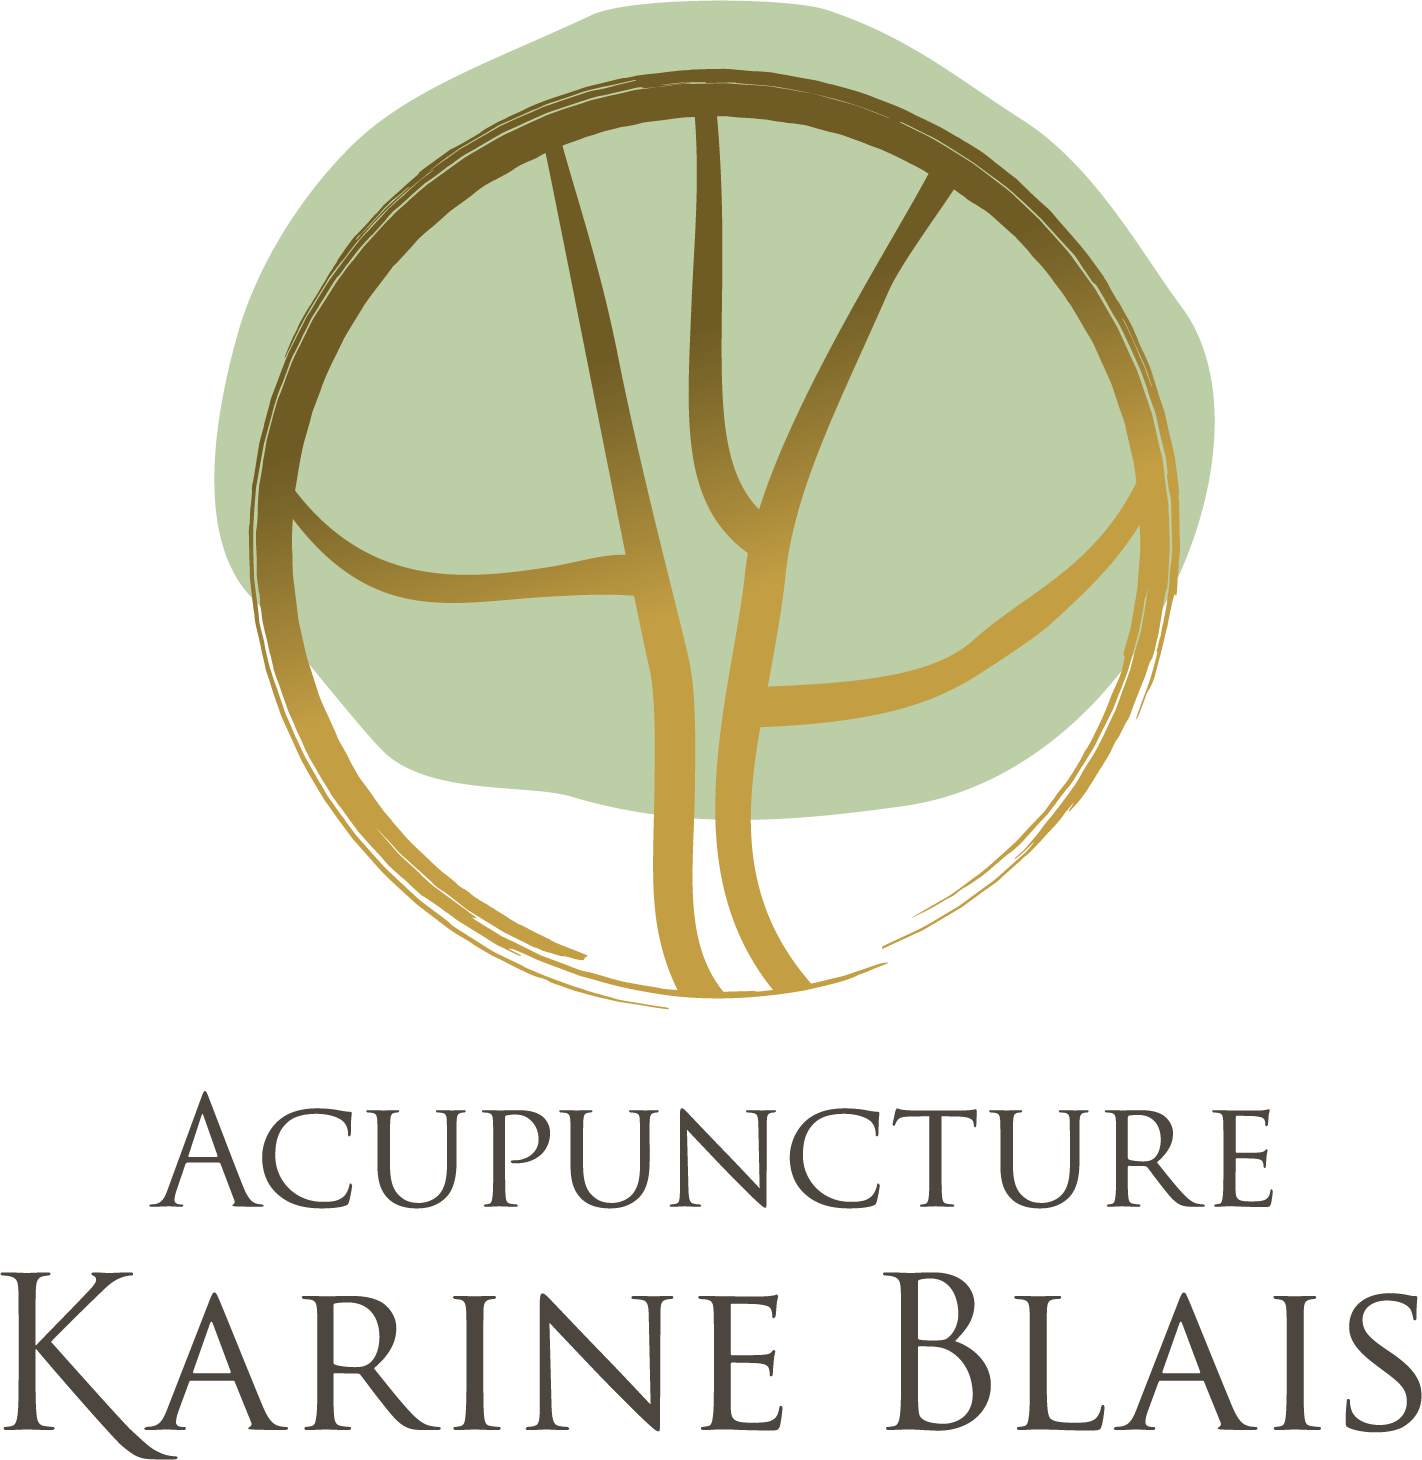 Acupuncture Karine Blais